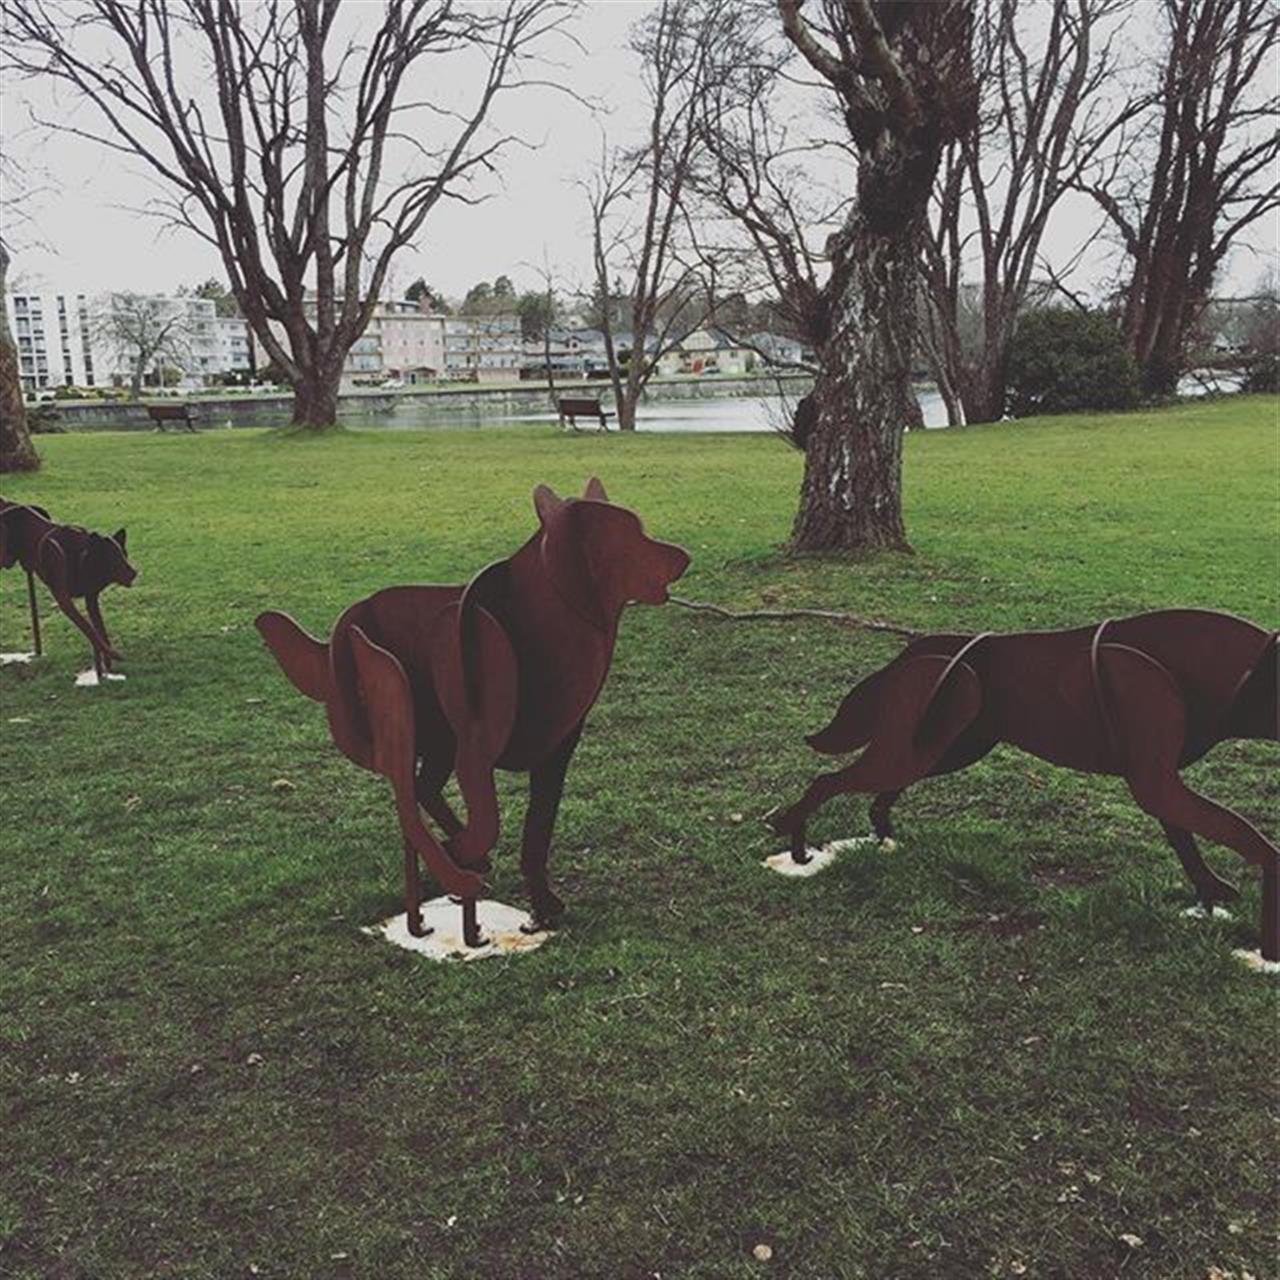 #wilddogs #oakbay #realtorlife #leadingrelocal #realestateagent #art